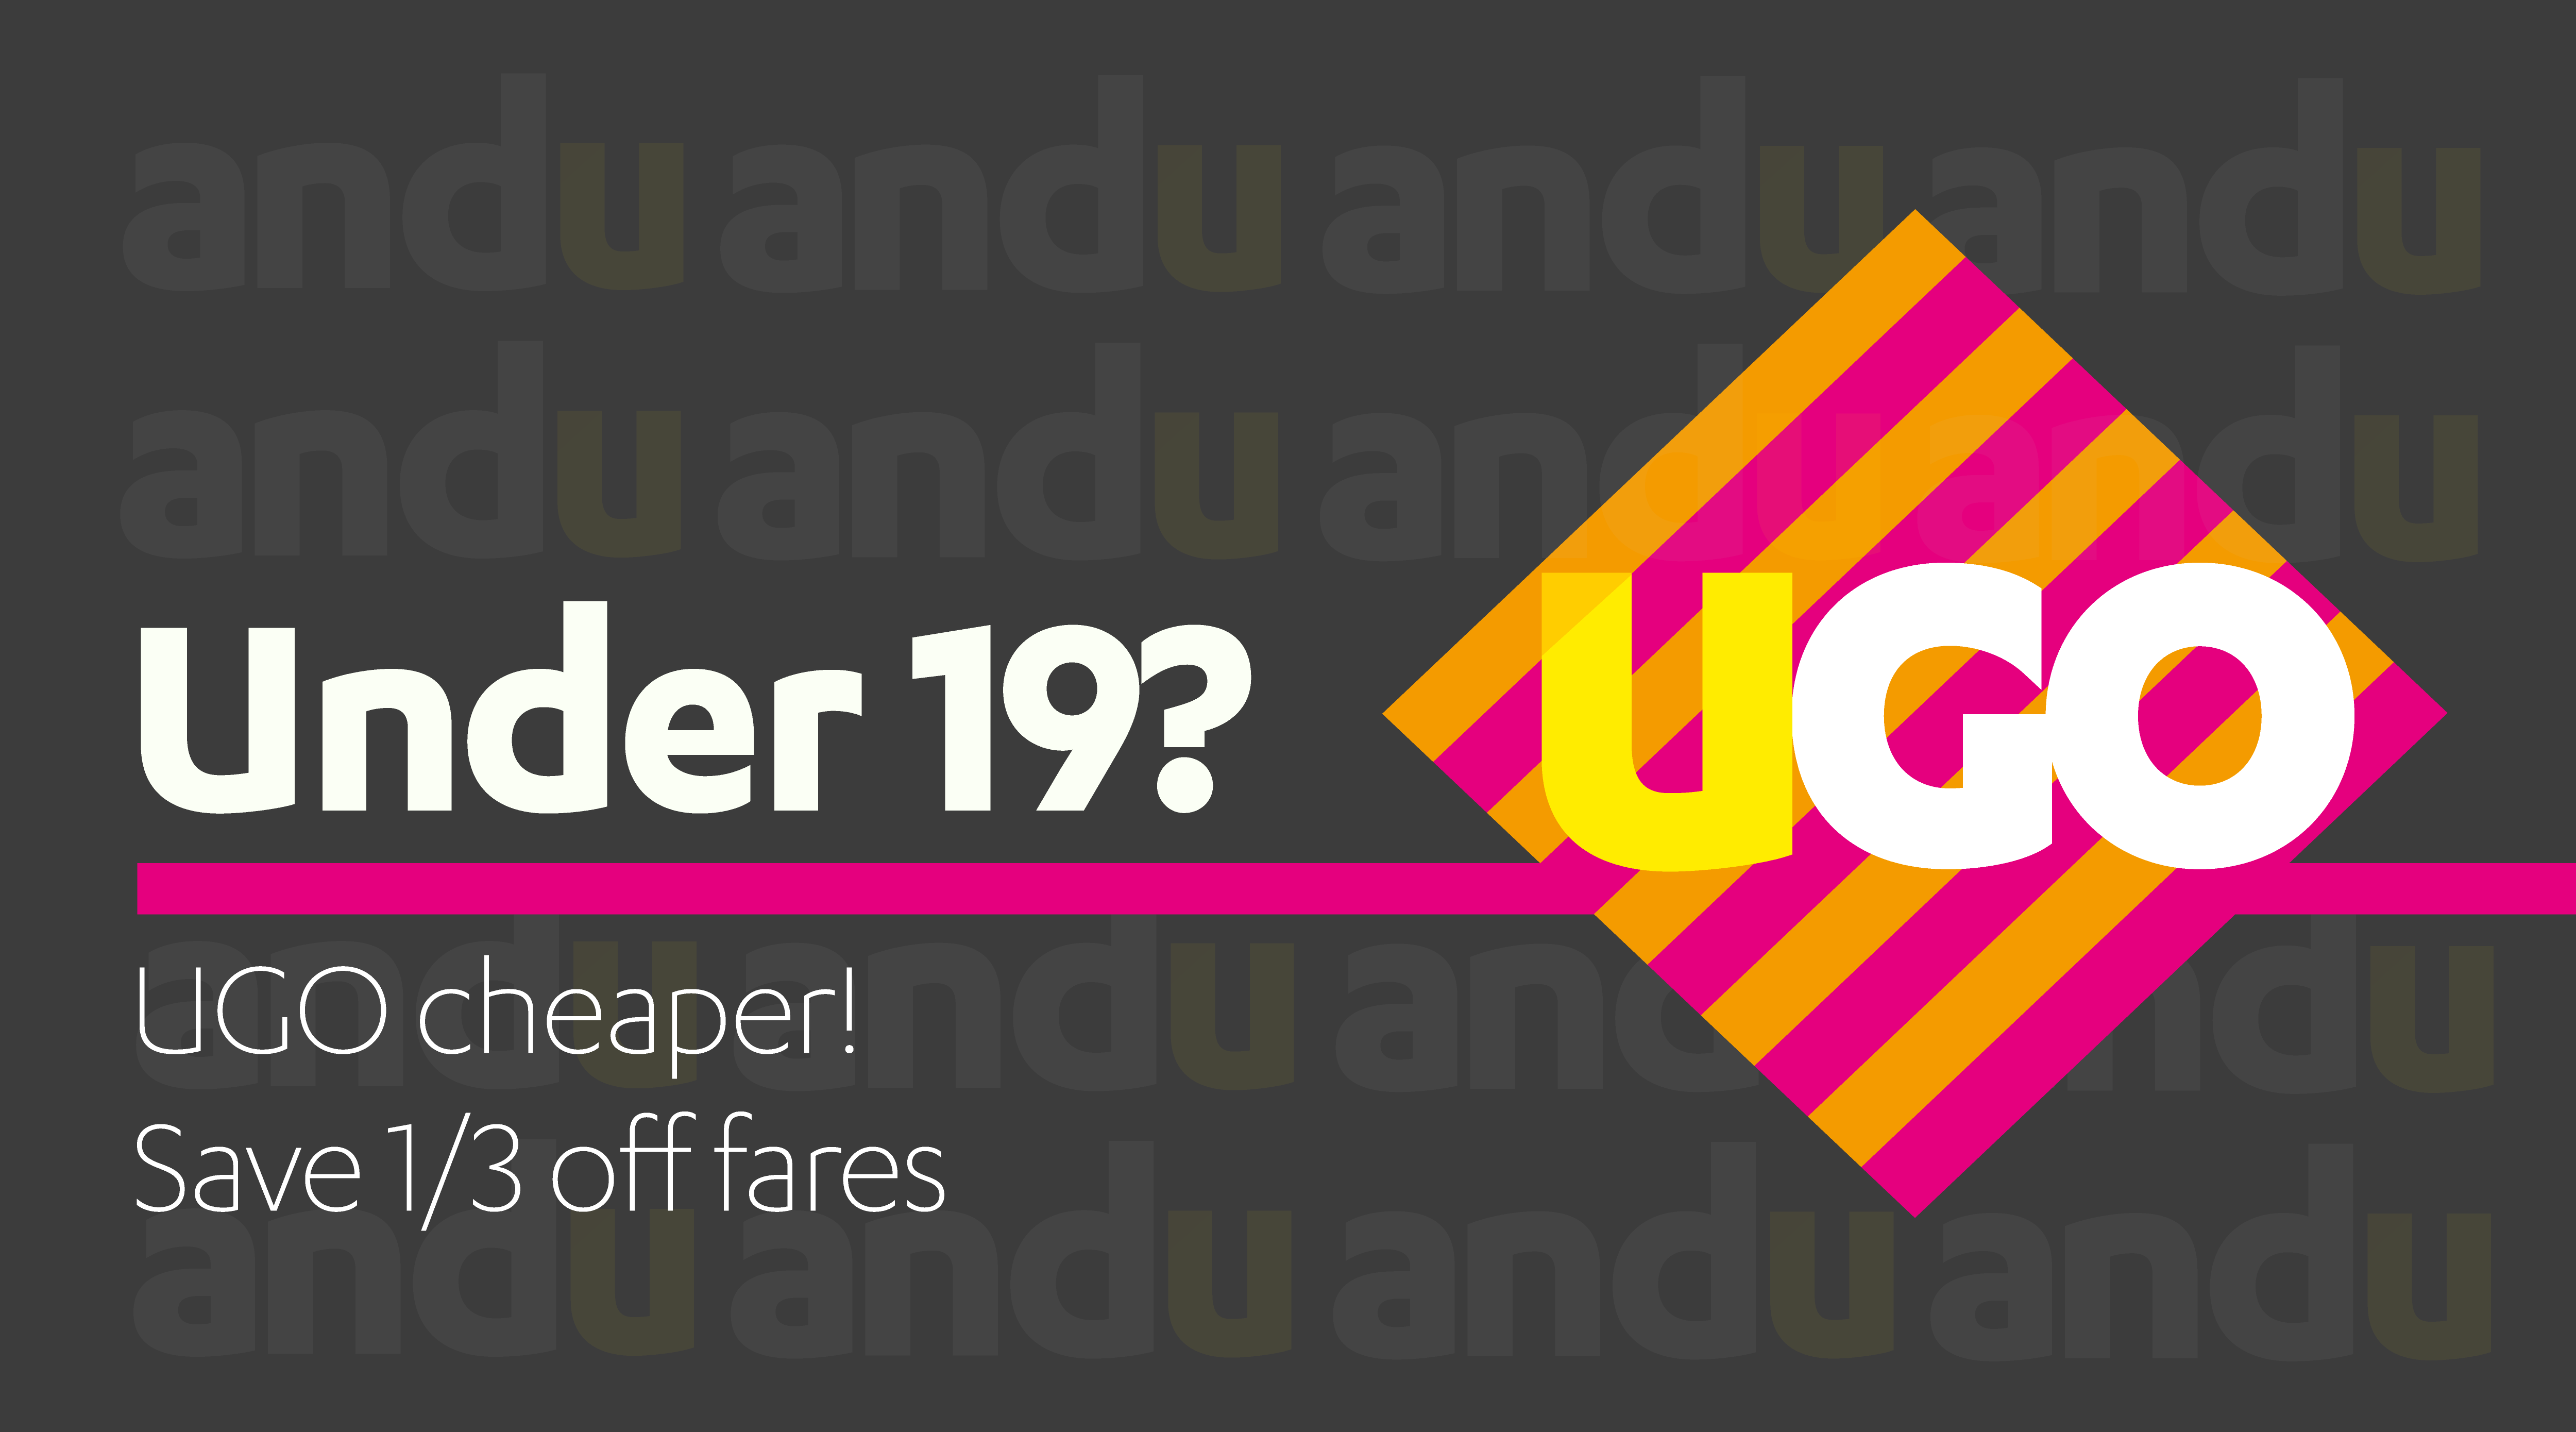 Under 19? UGO cheaper!